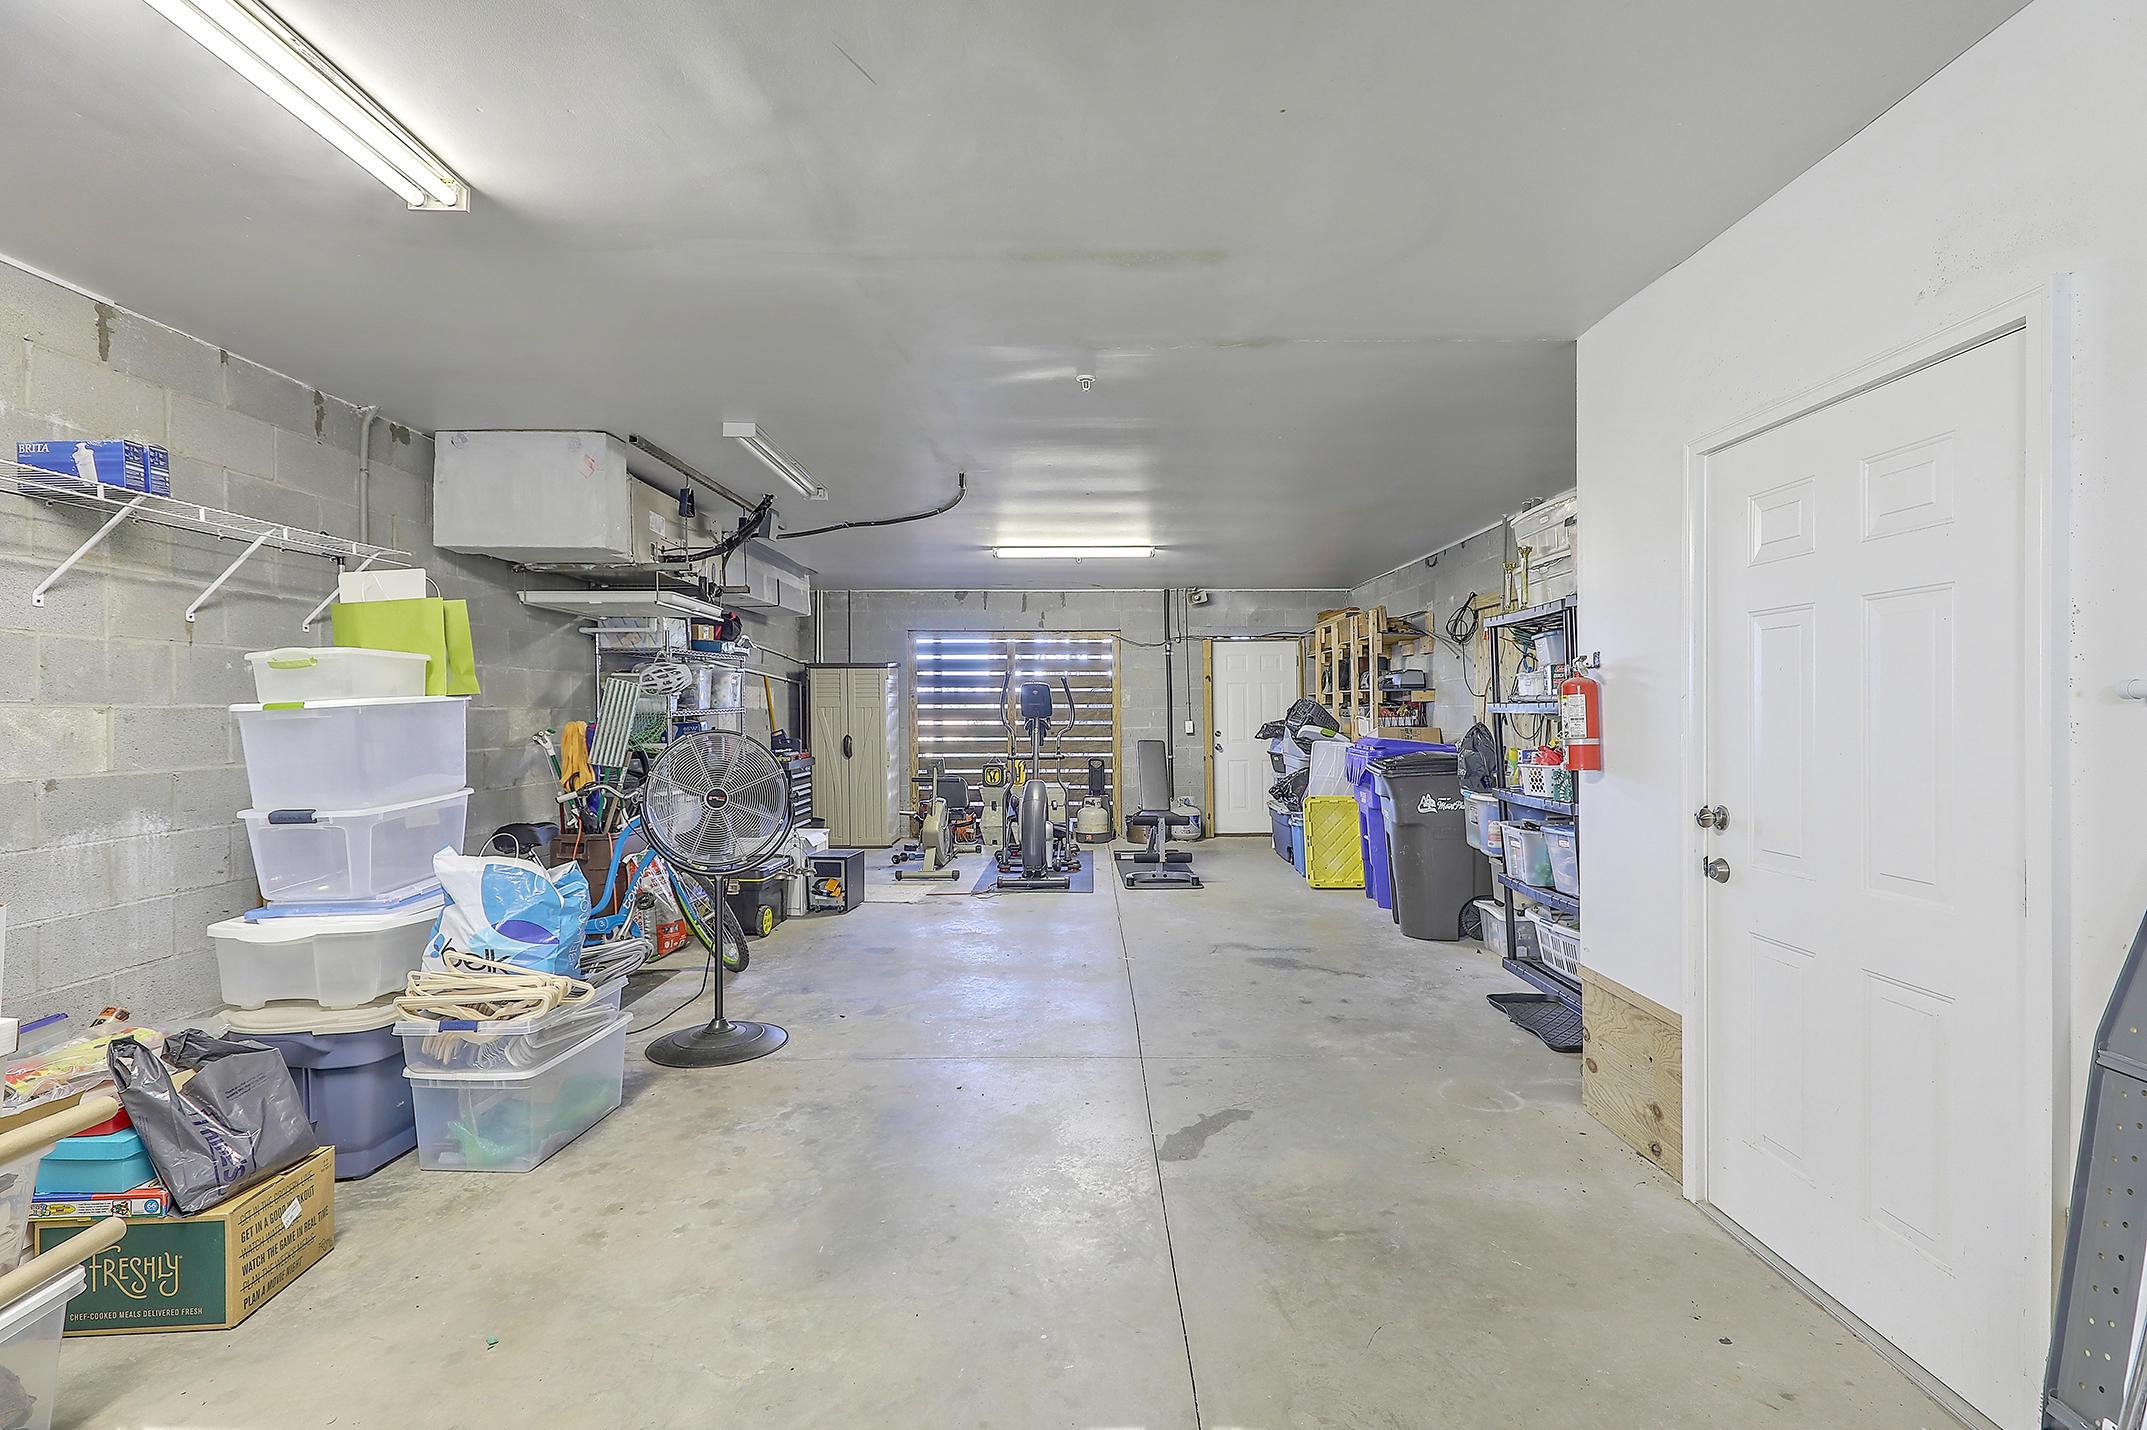 Etiwan Pointe Homes For Sale - 124 Winding Creek, Mount Pleasant, SC - 5